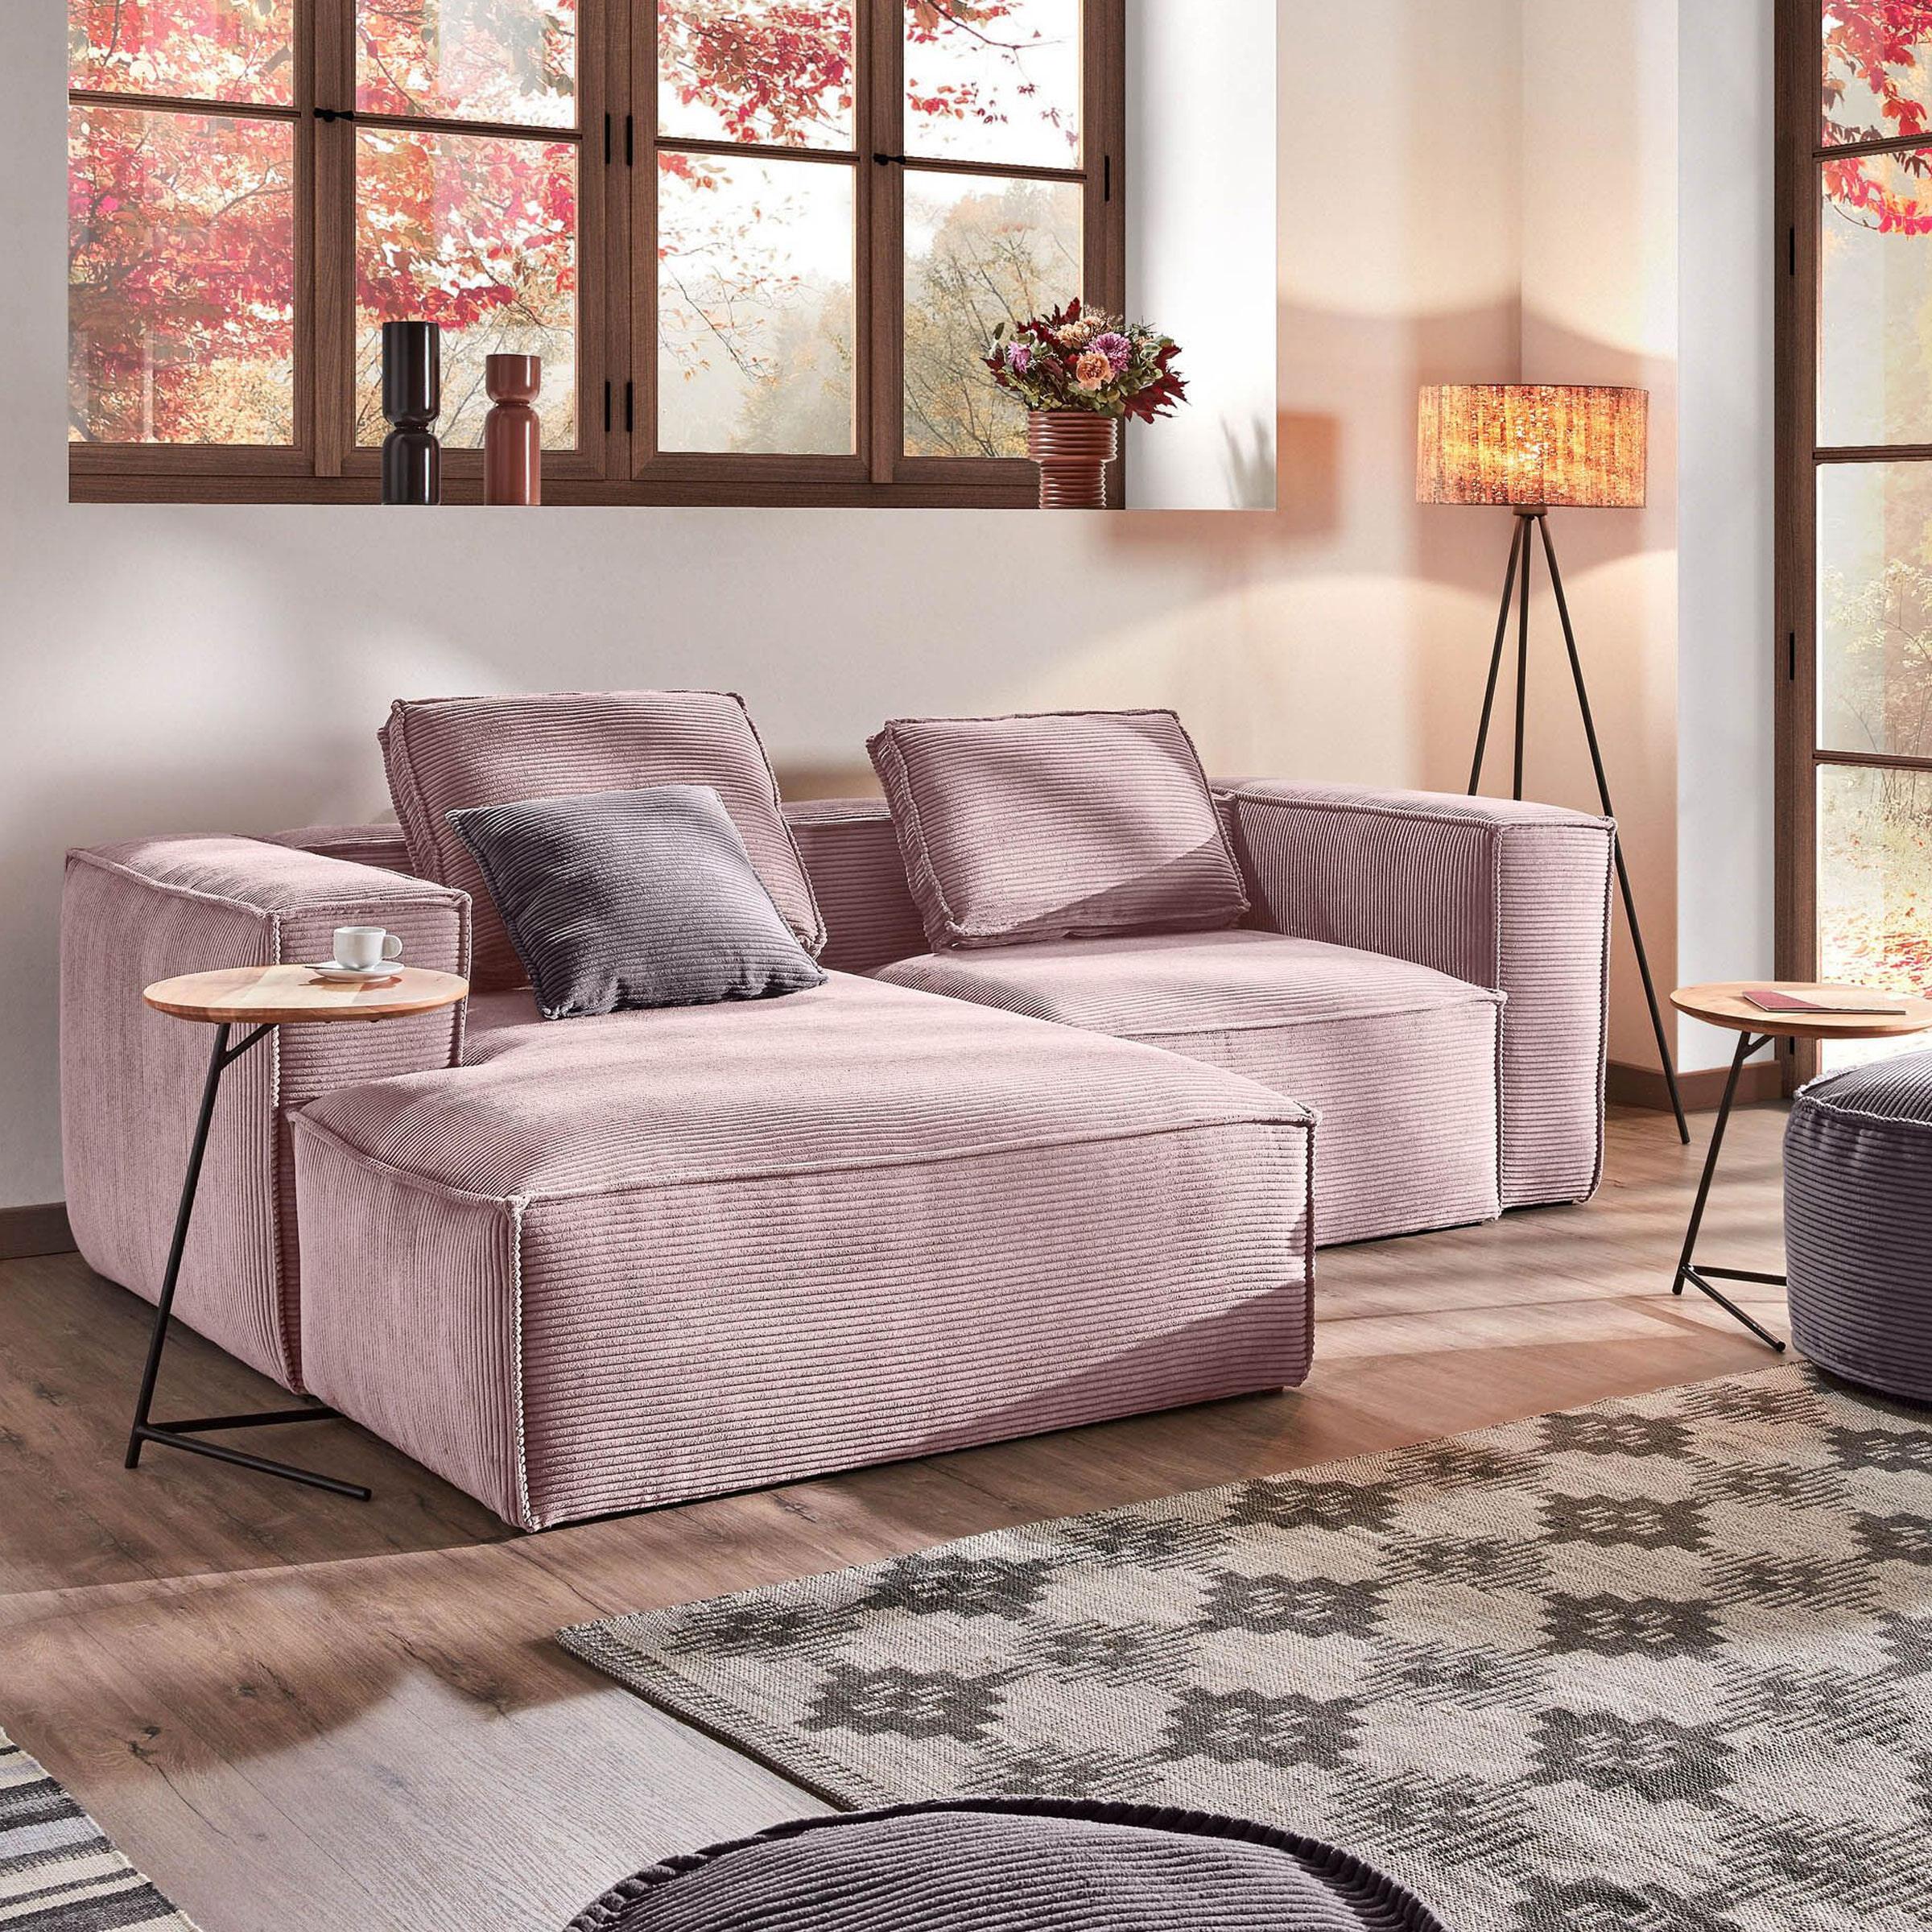 Kave Home Loungebank 'Blok' Rib, Links 240cm, kleur Roze